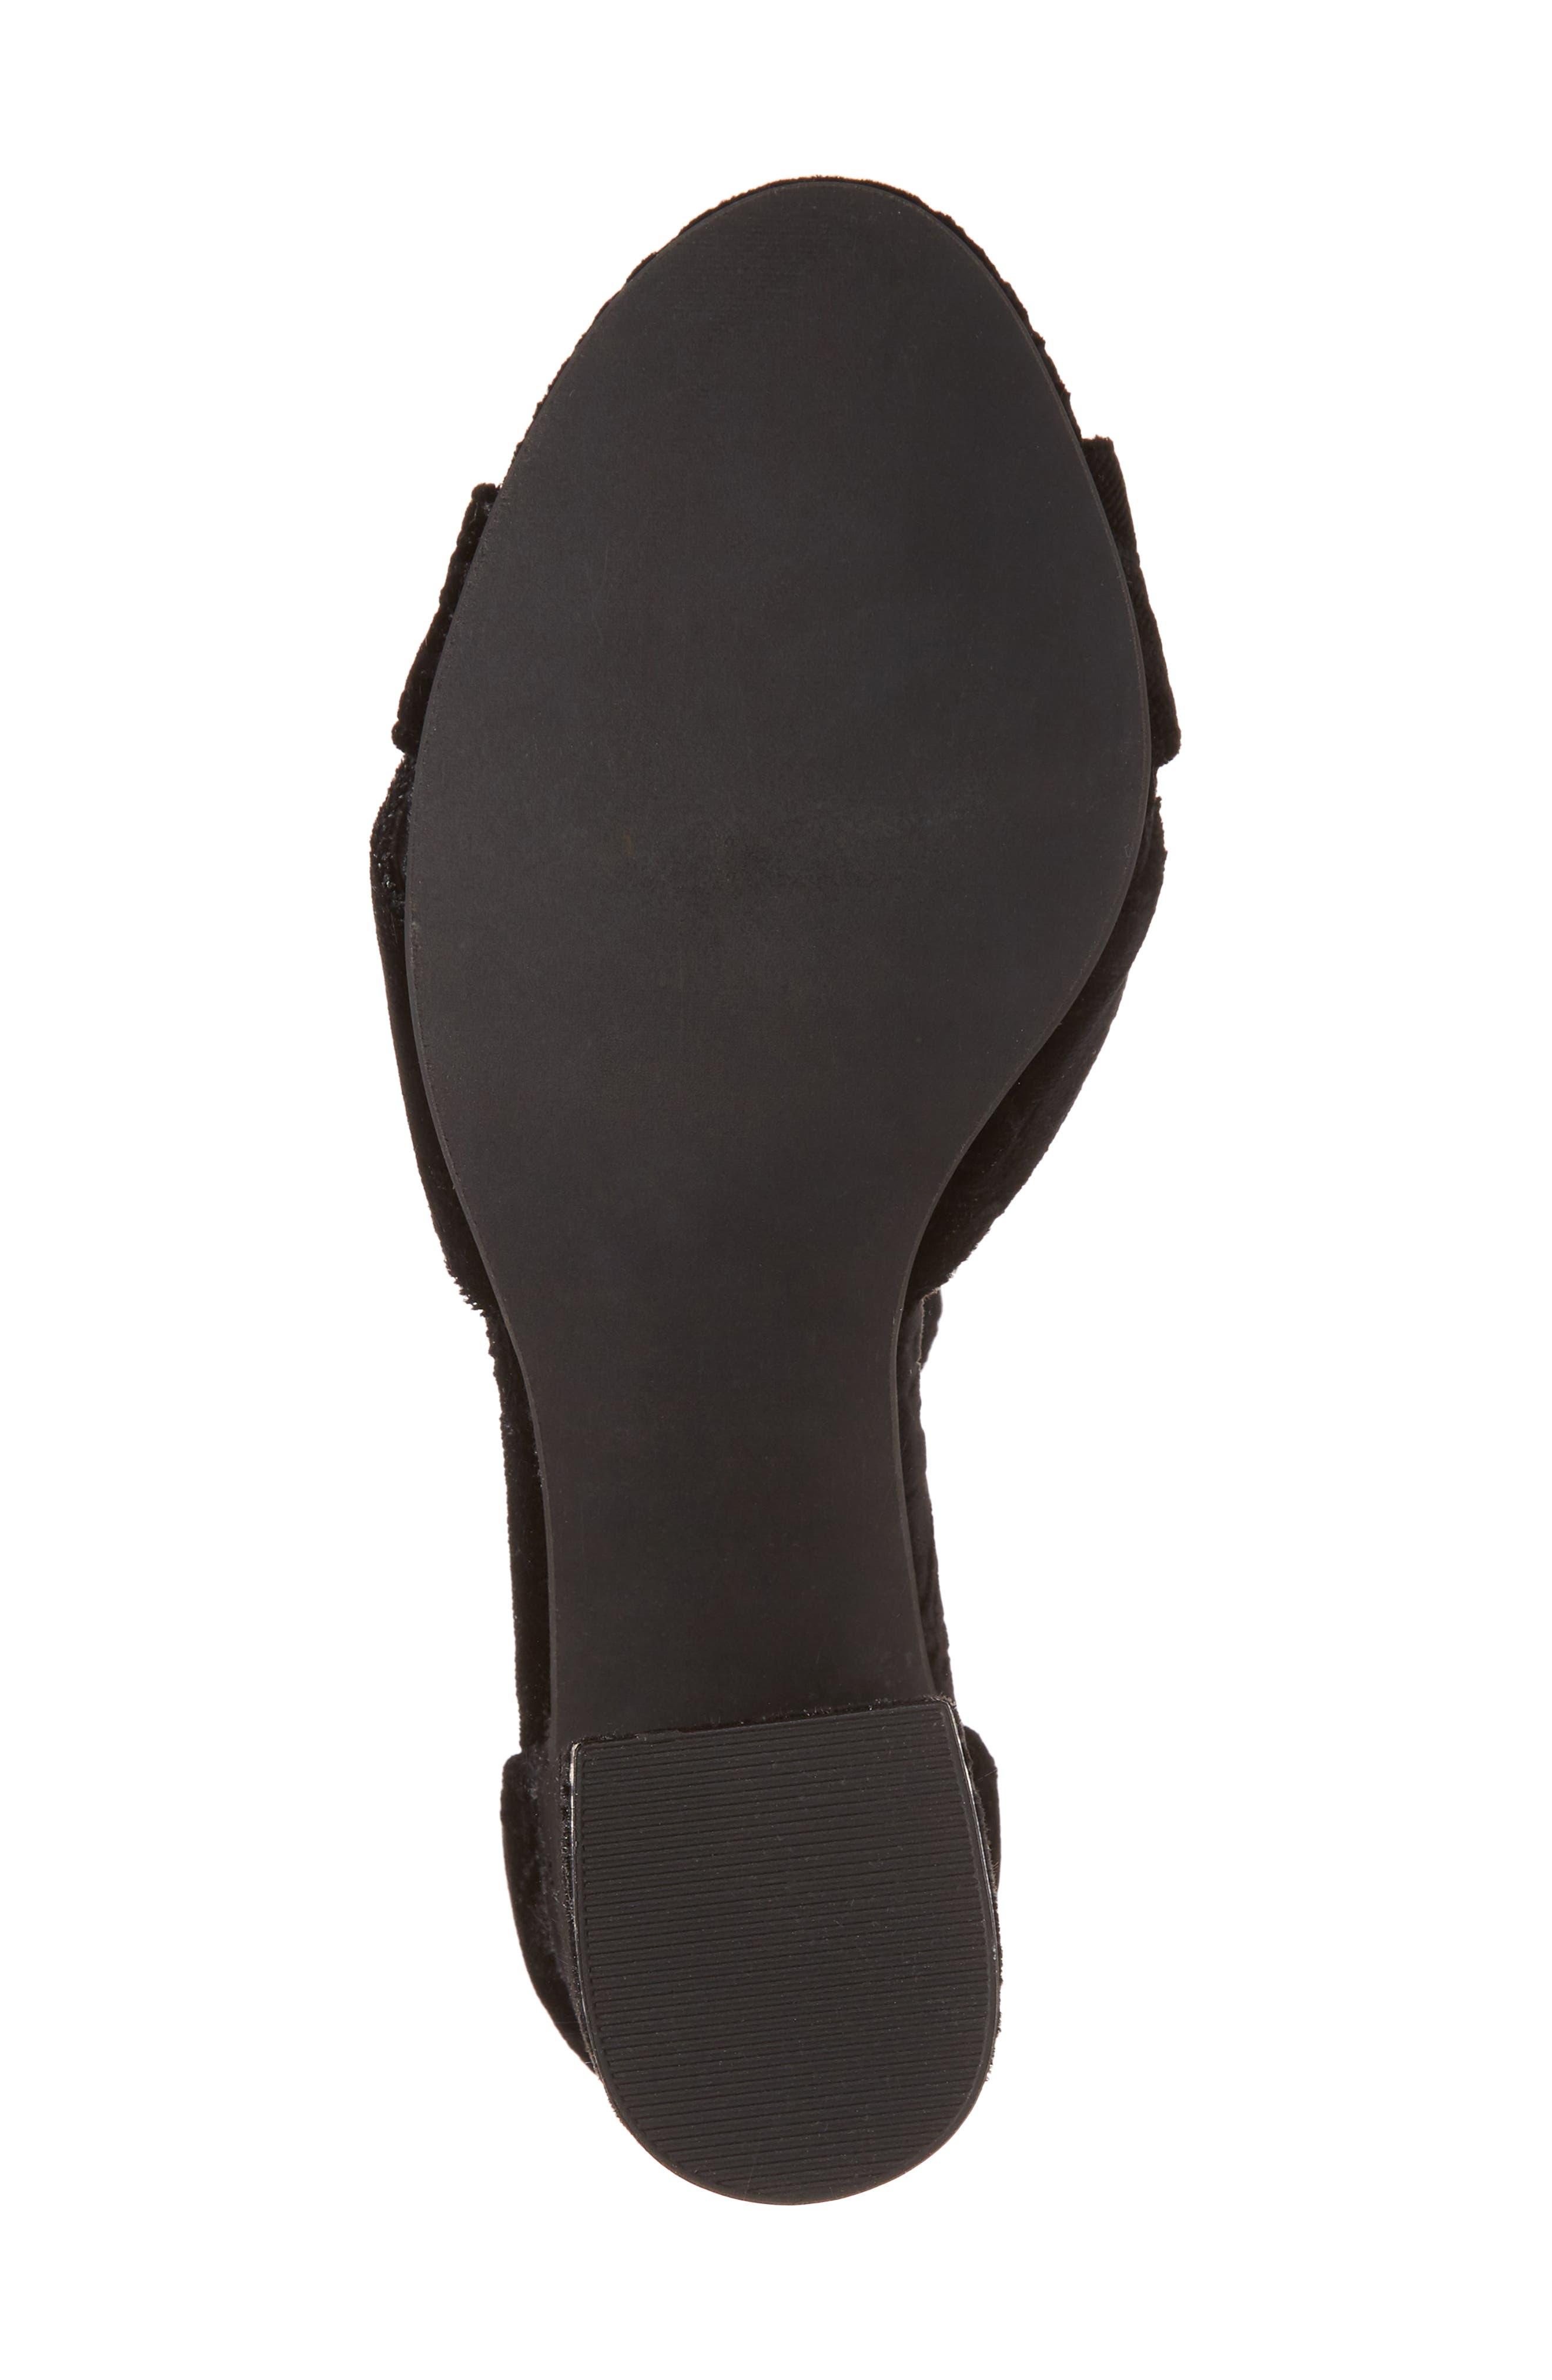 BP Casey Ankle Strap Sandal,                             Alternate thumbnail 6, color,                             006